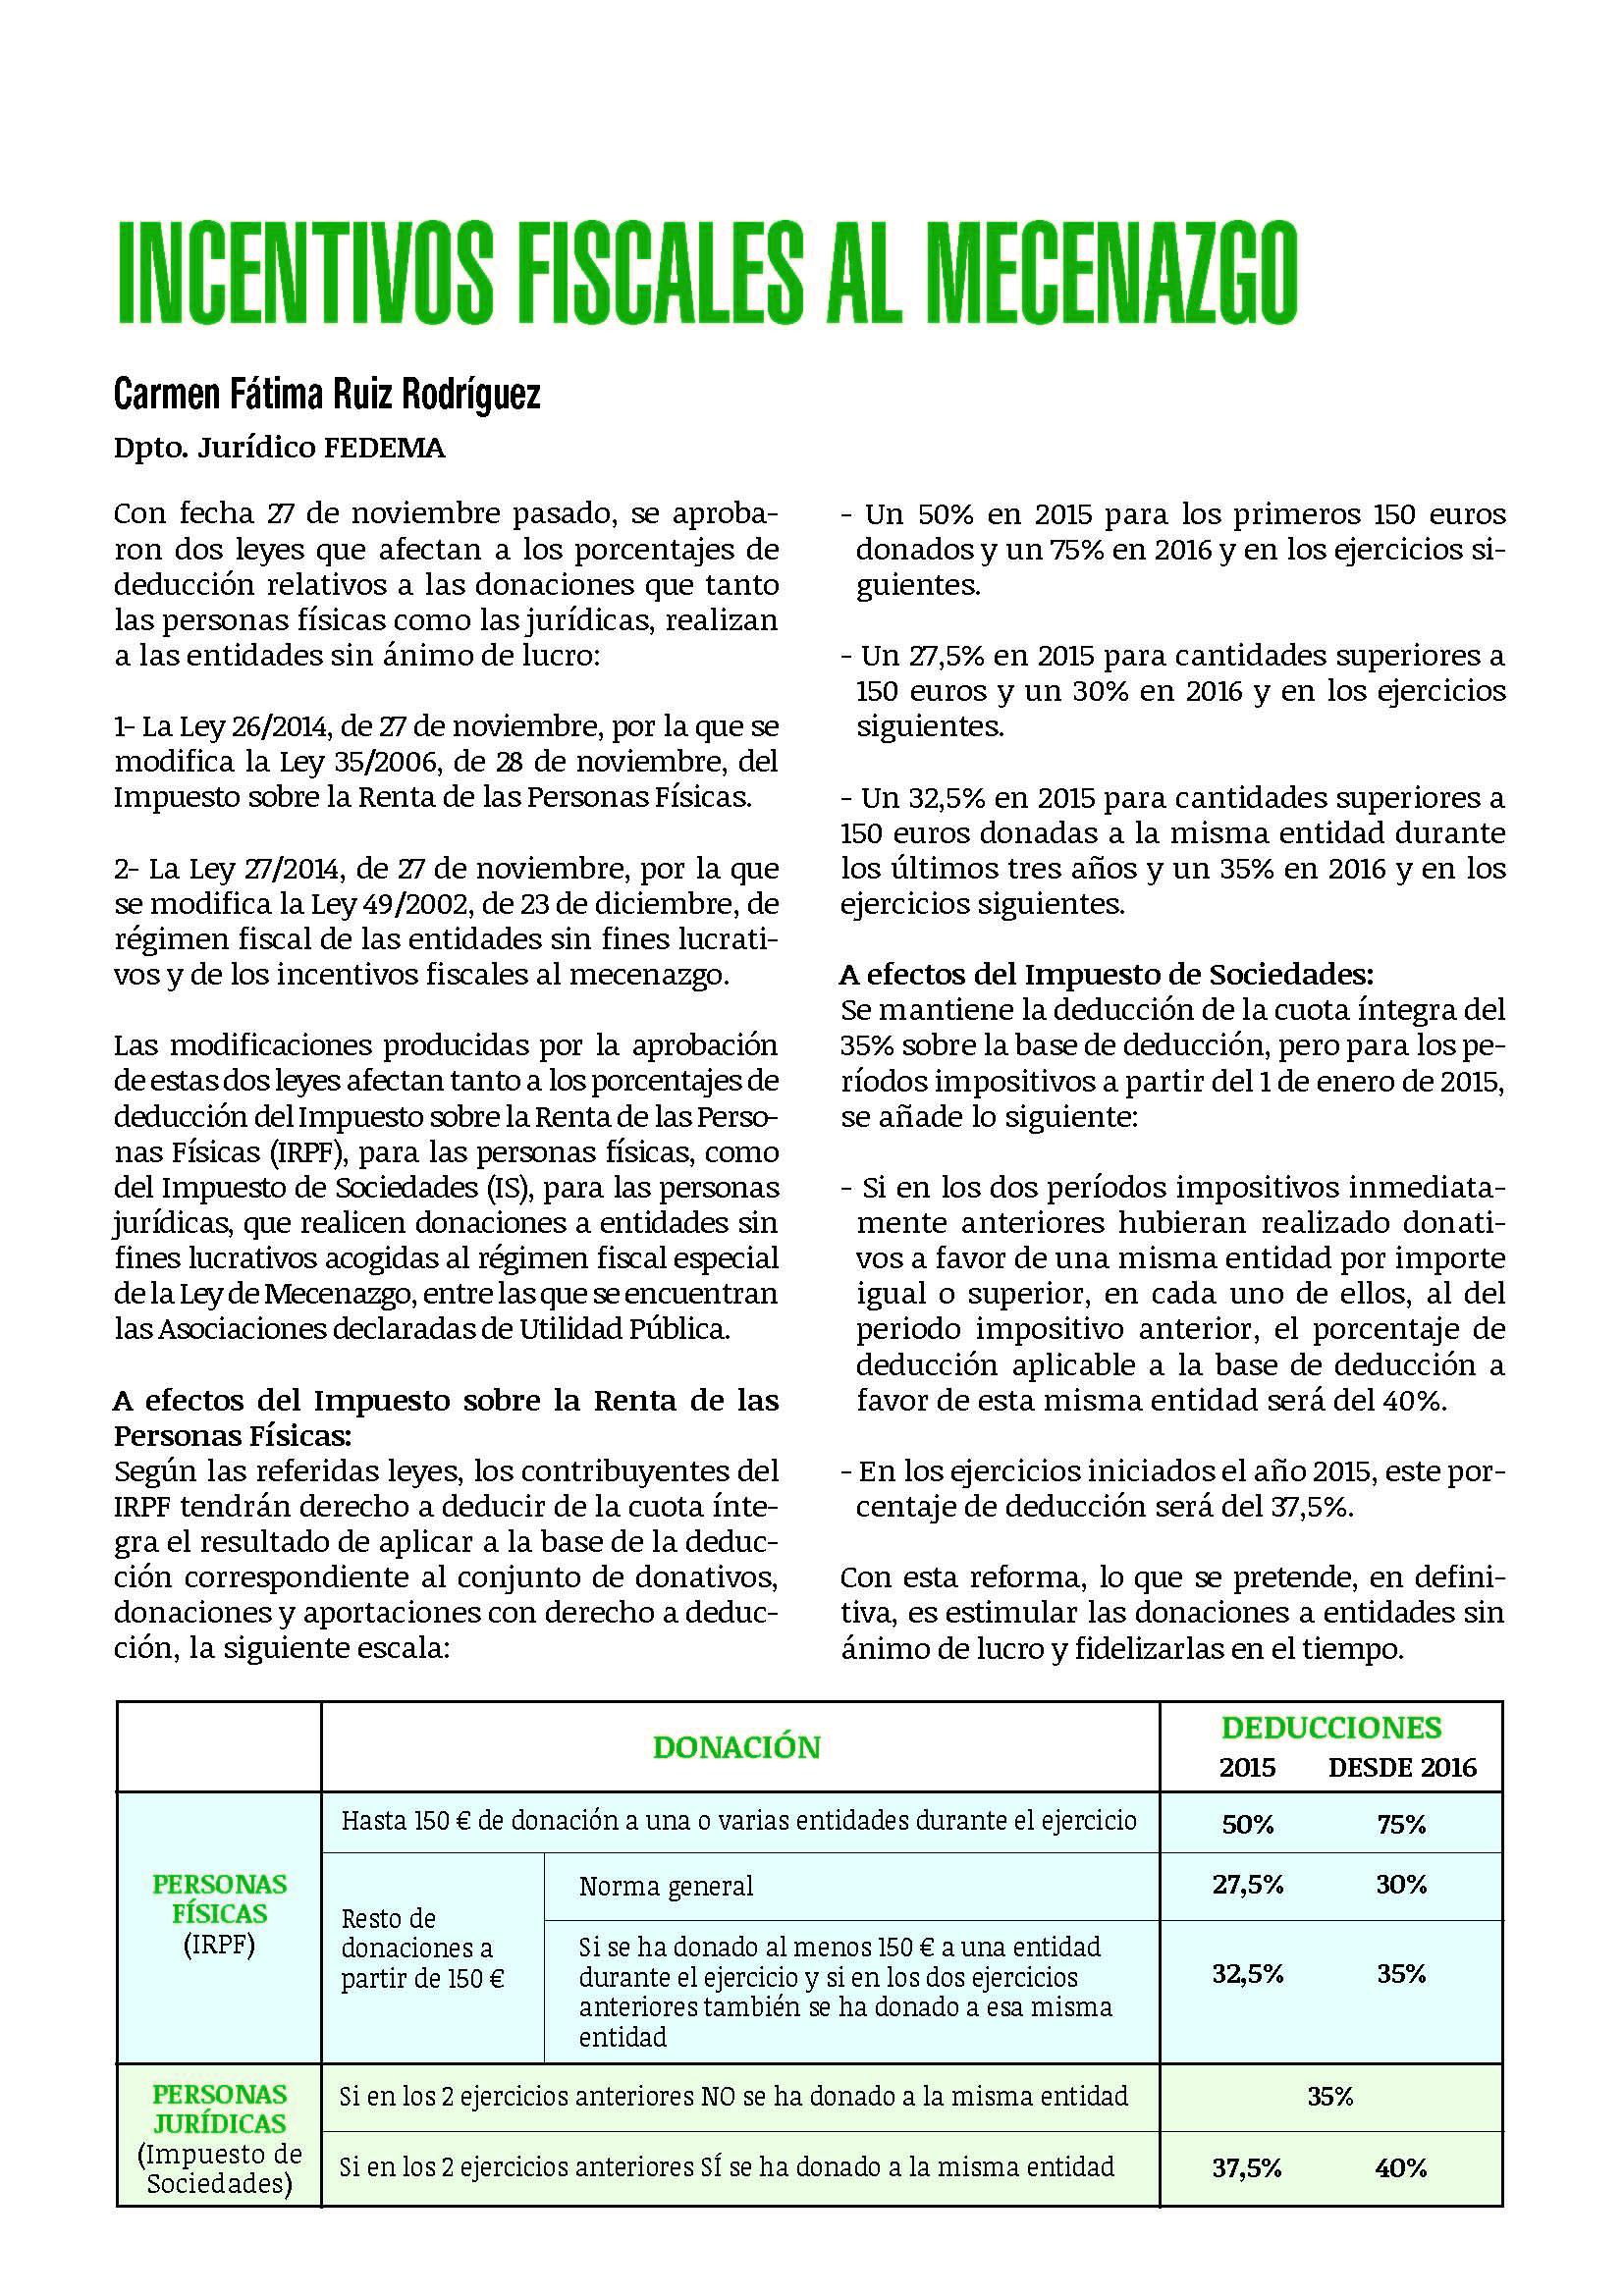 Incentivos fiscales de mecenazgo